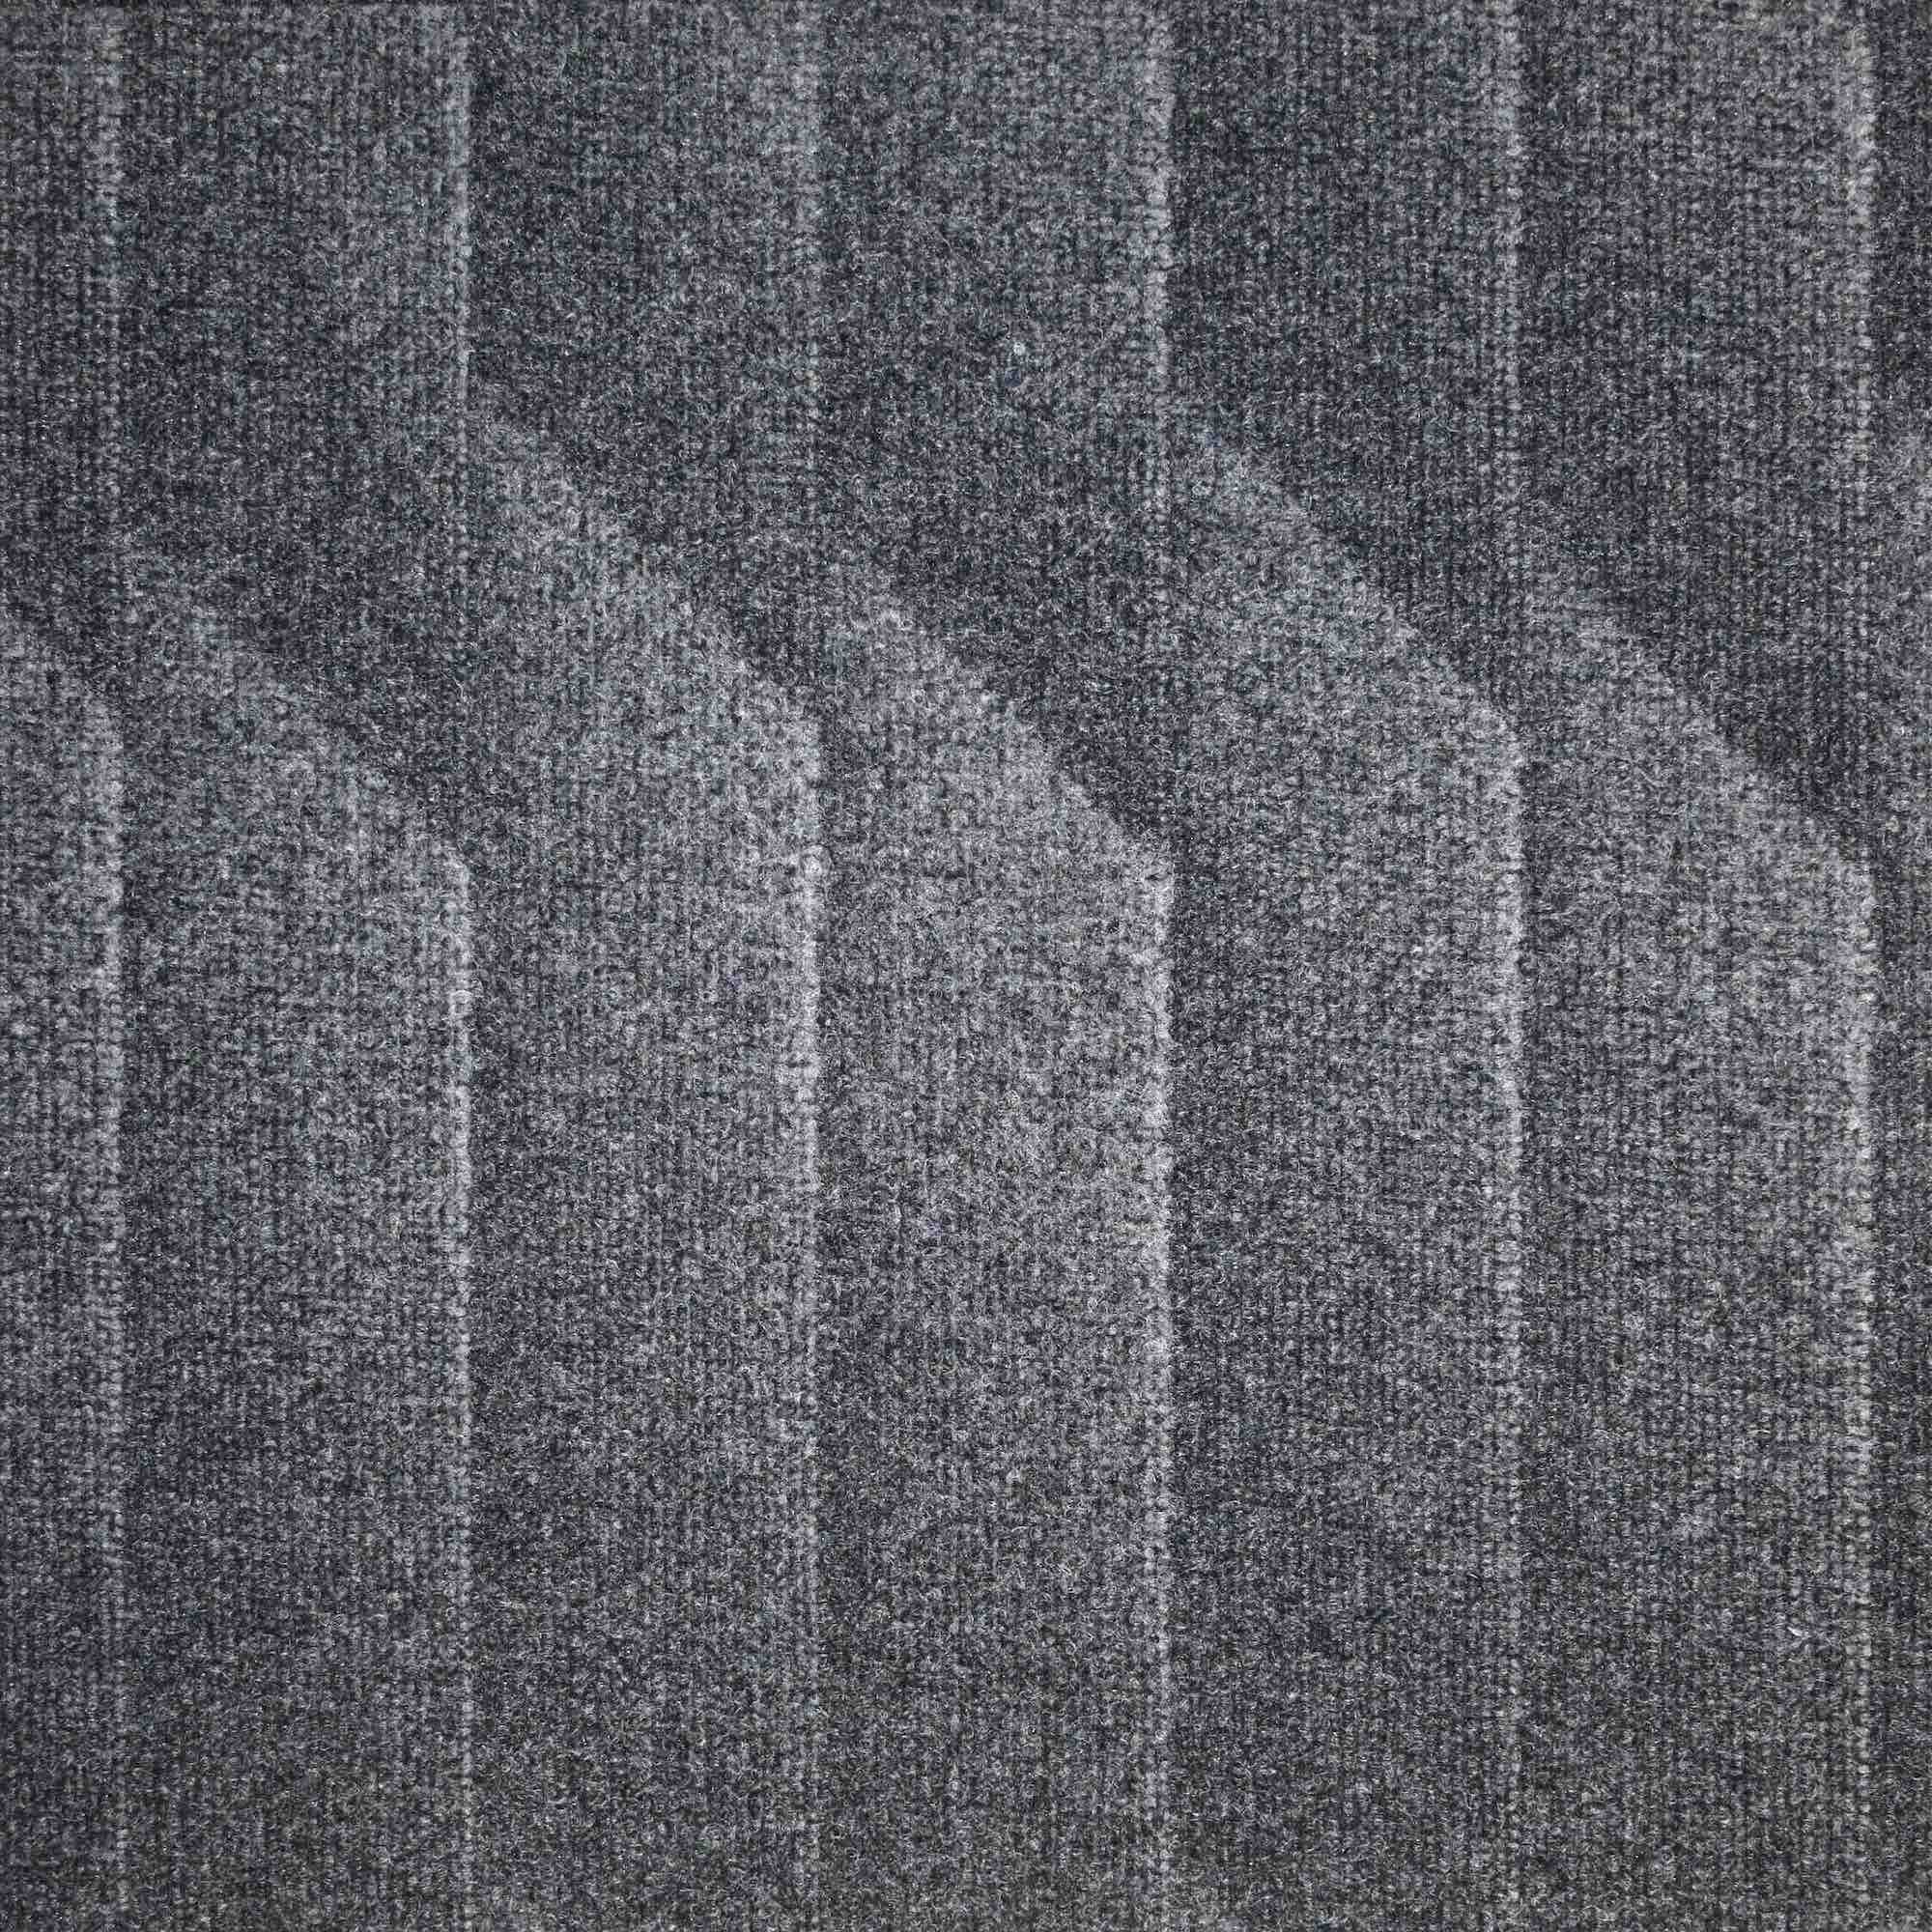 Heckmondwike | Fibre Bonded Carpets | Education Carpet | Odyssey Anthracite